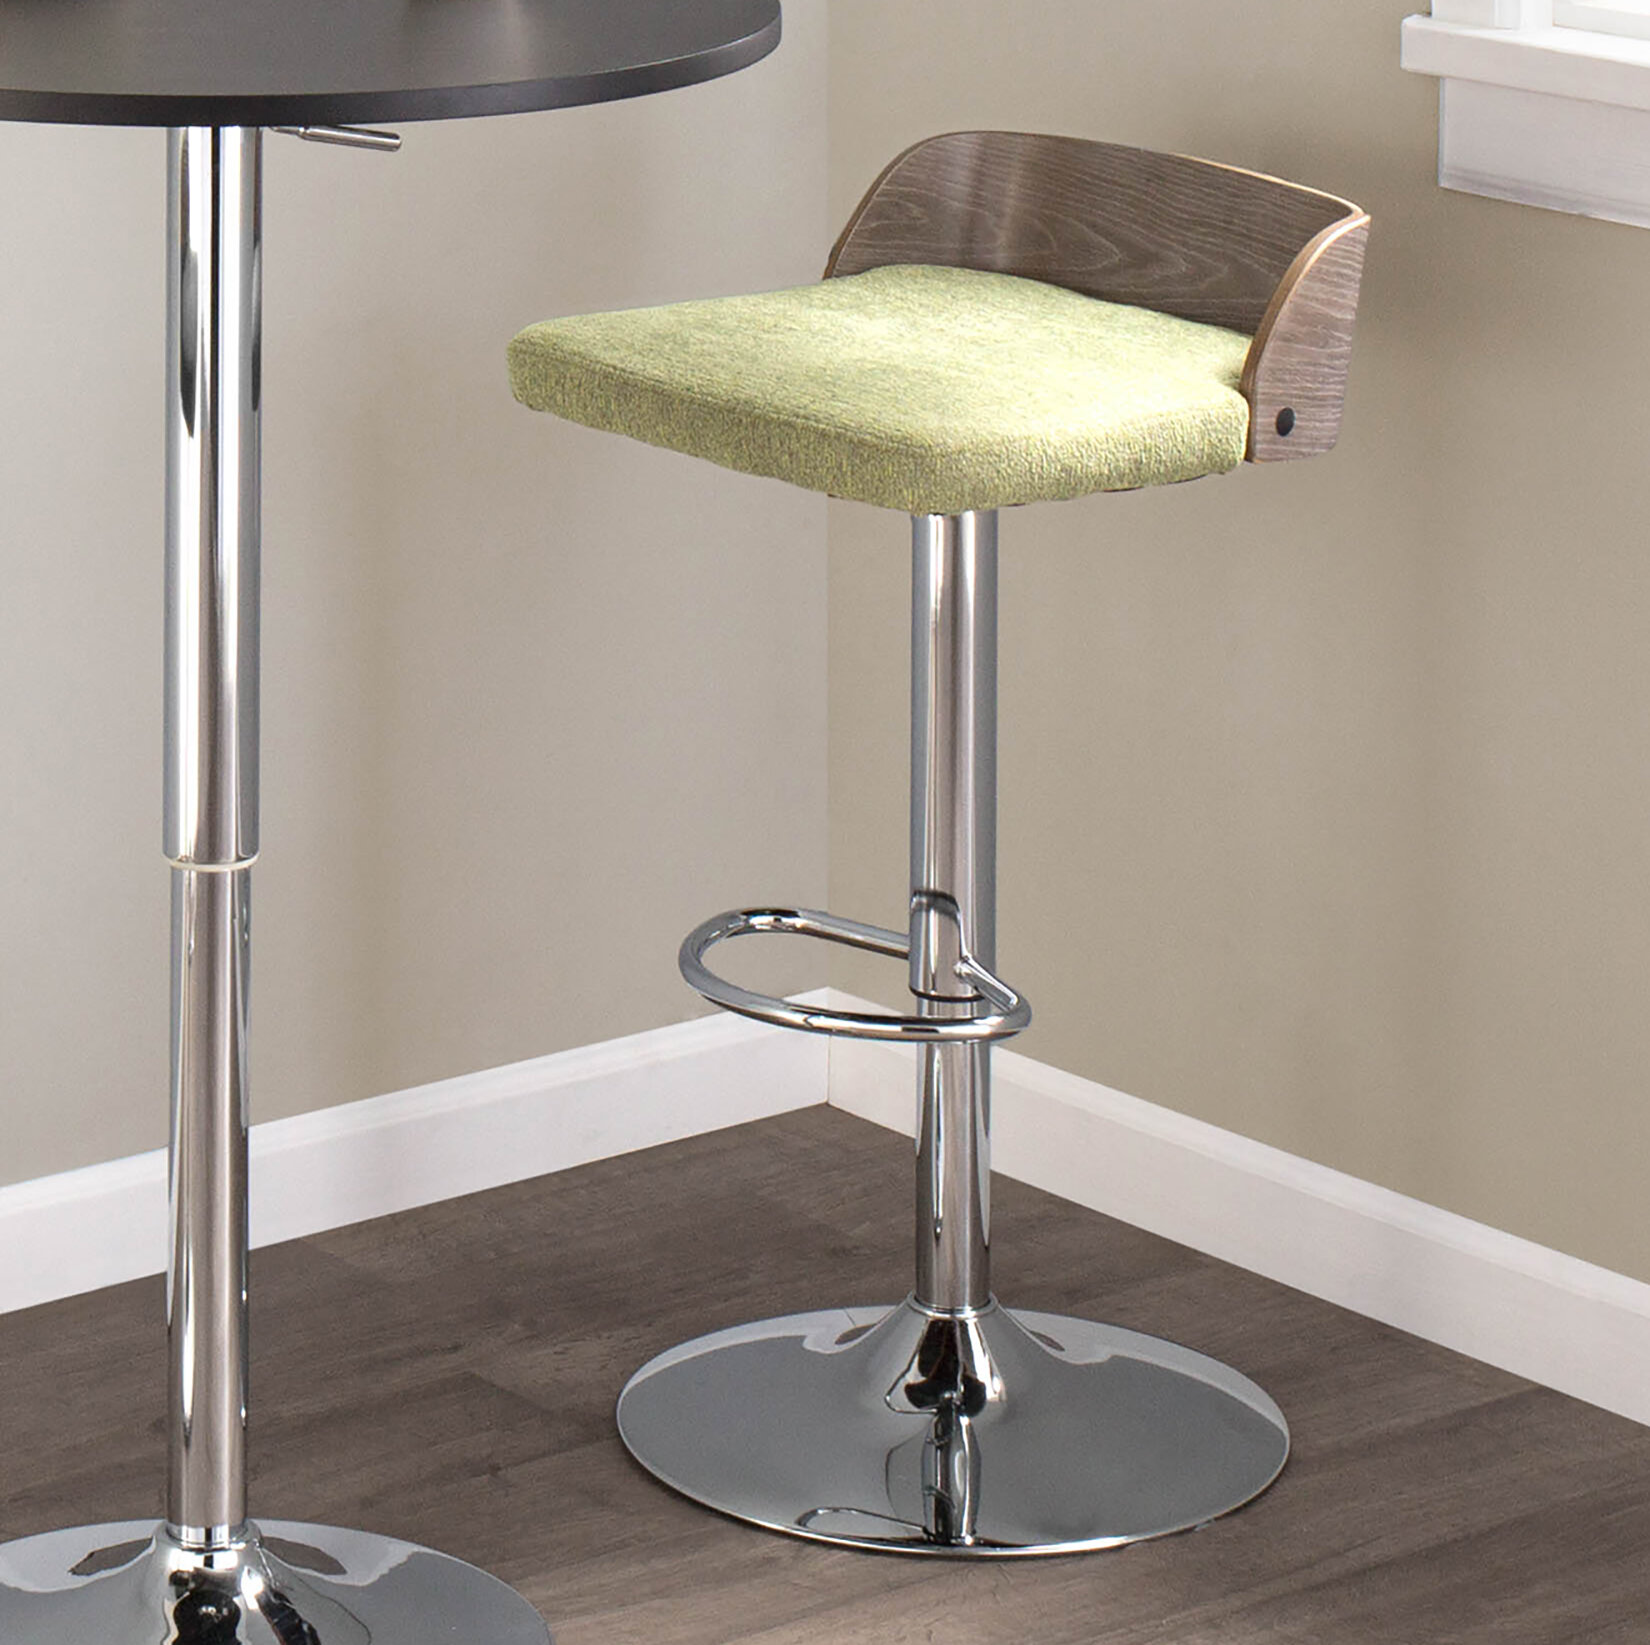 Excellent Rockaway Adjustable Height Swivel Bar Stool Cjindustries Chair Design For Home Cjindustriesco